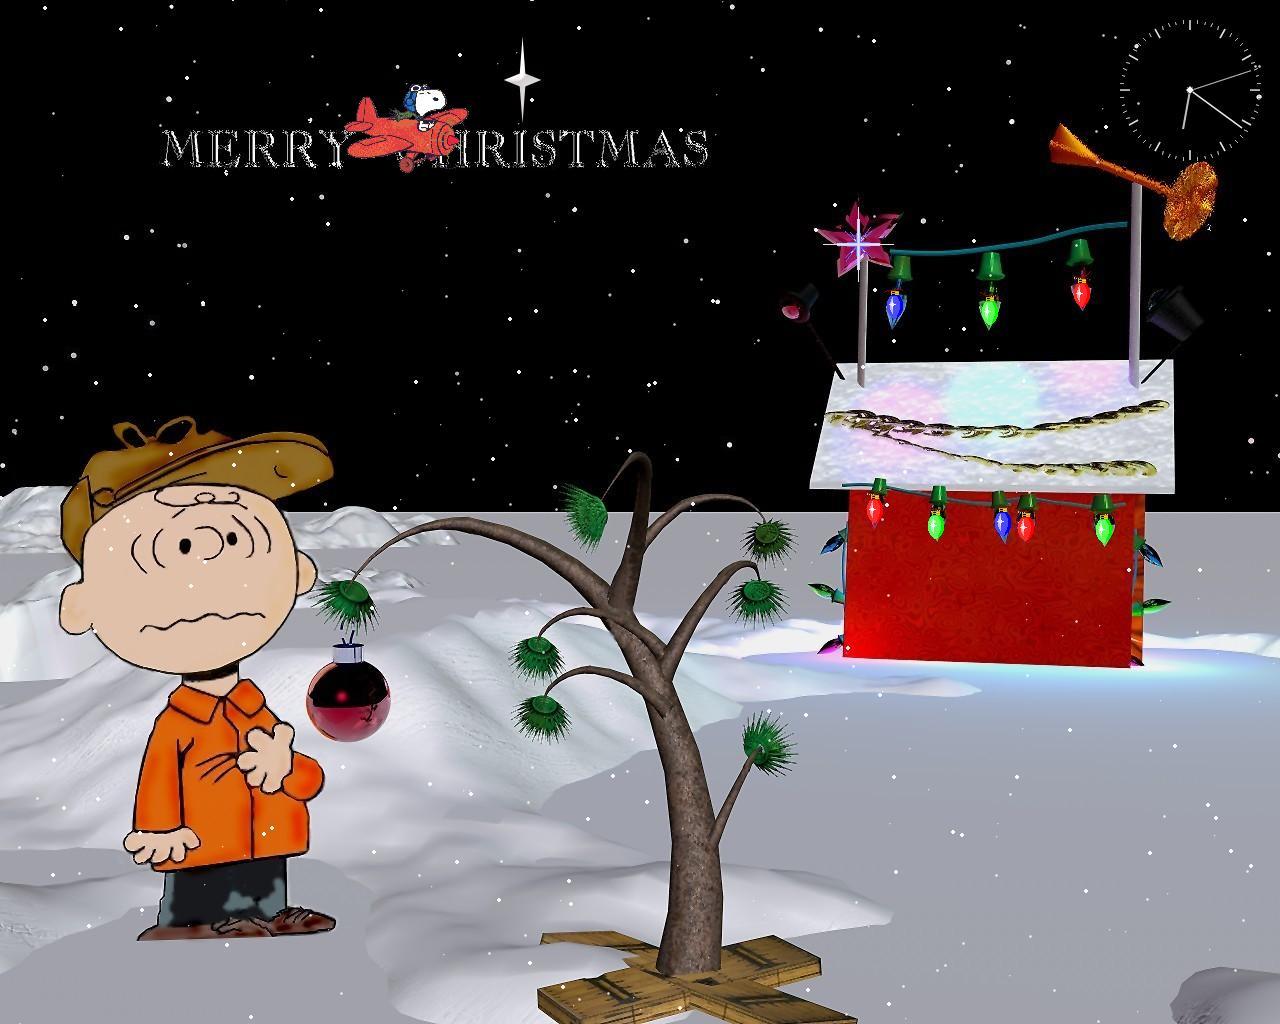 Charlie Brown Christmas Wallpaper Desktop 1 1280x1024